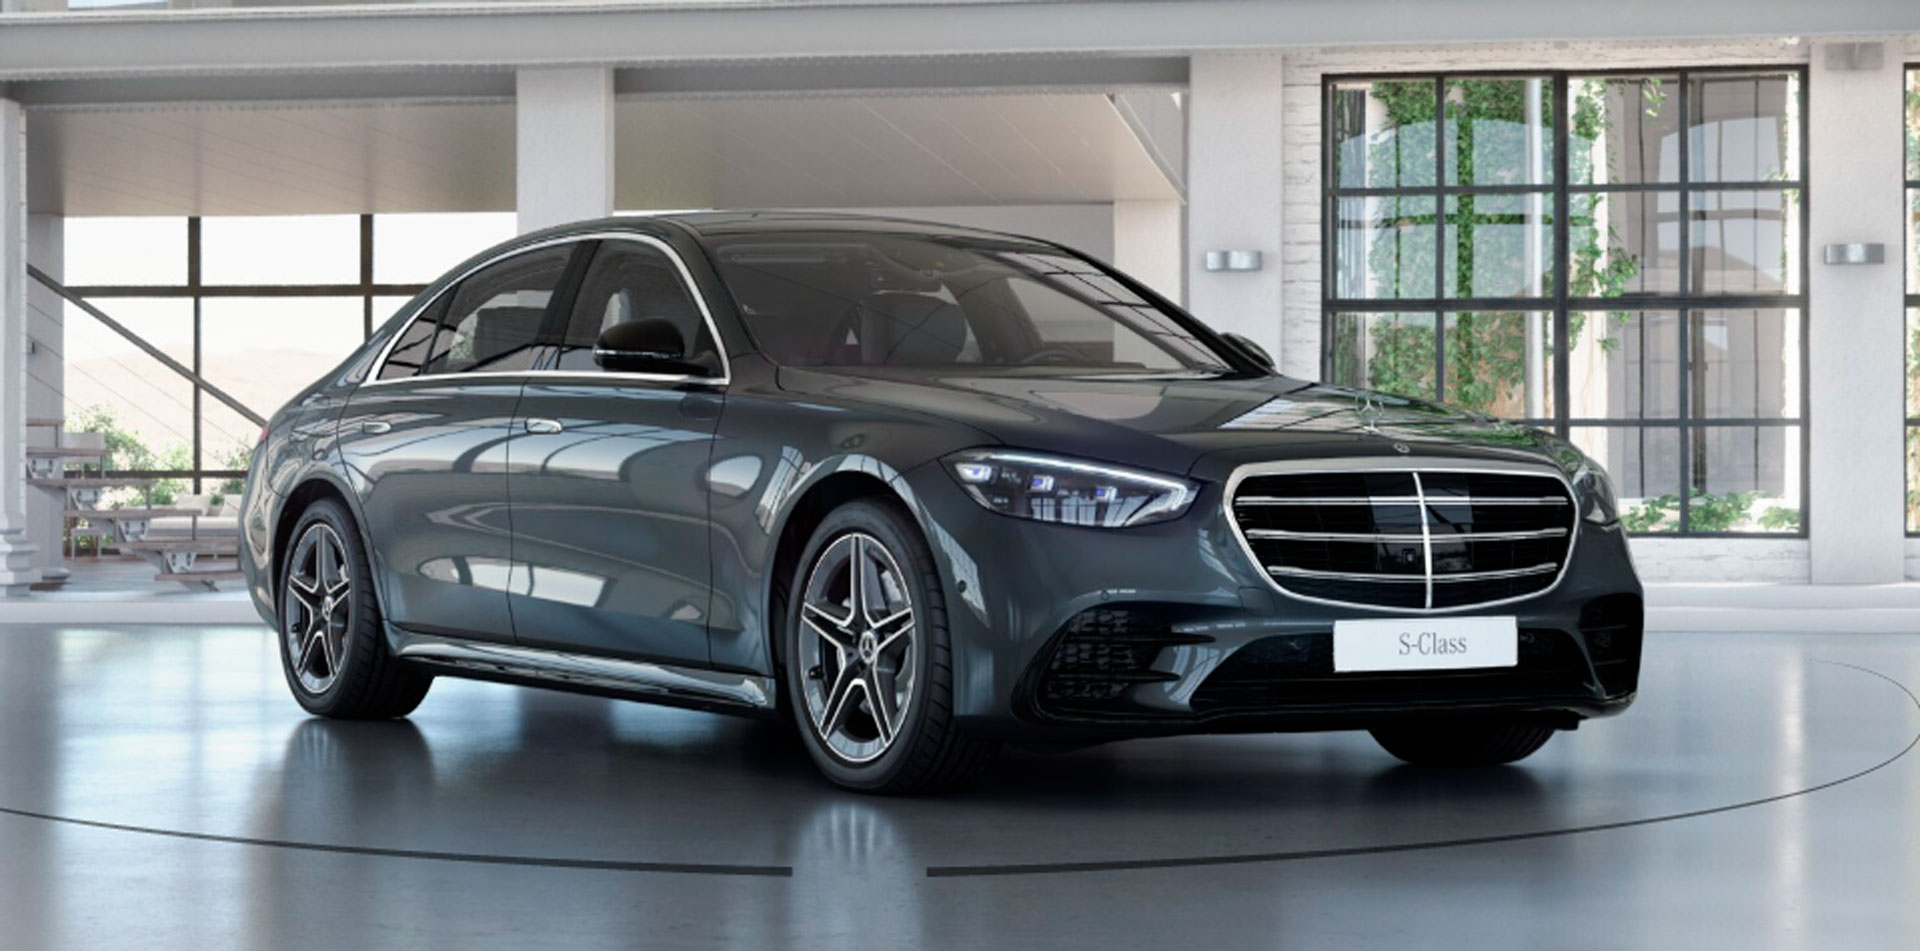 Mercedes-Benz S-Class Limousine 0152601220